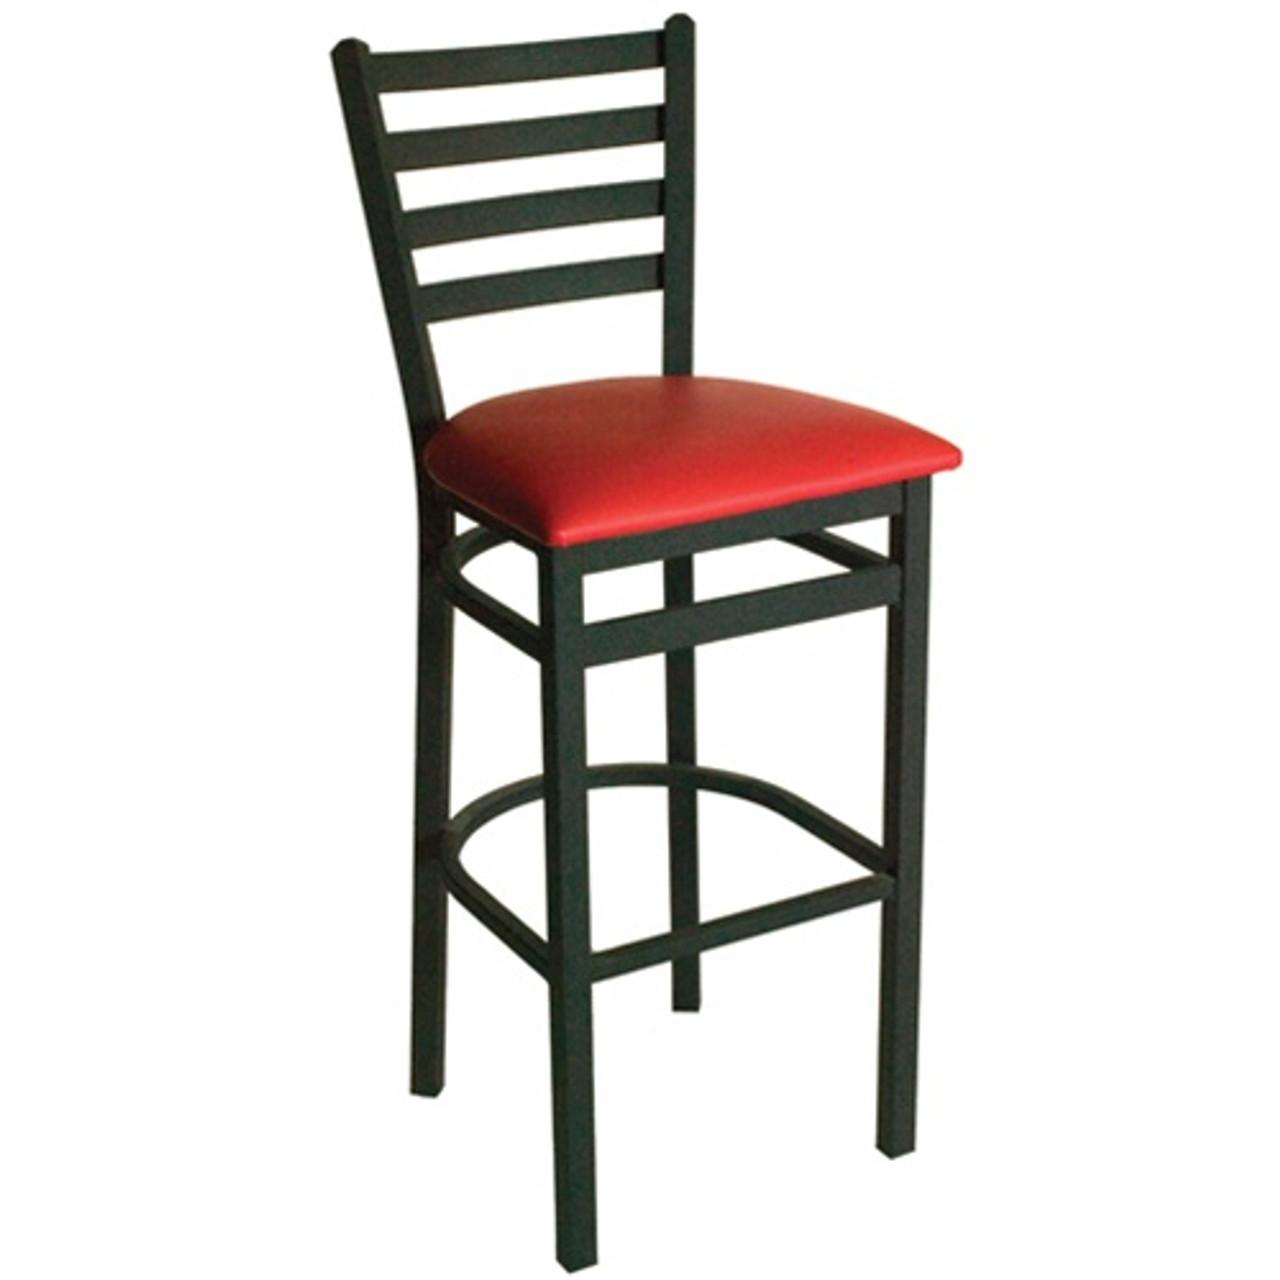 Bfm Seating Lima Metal Ladder Back Restaurant Bar Stool With Padded Seat 2160b Sbv Pub Bar Stools Commercial Bar Stools